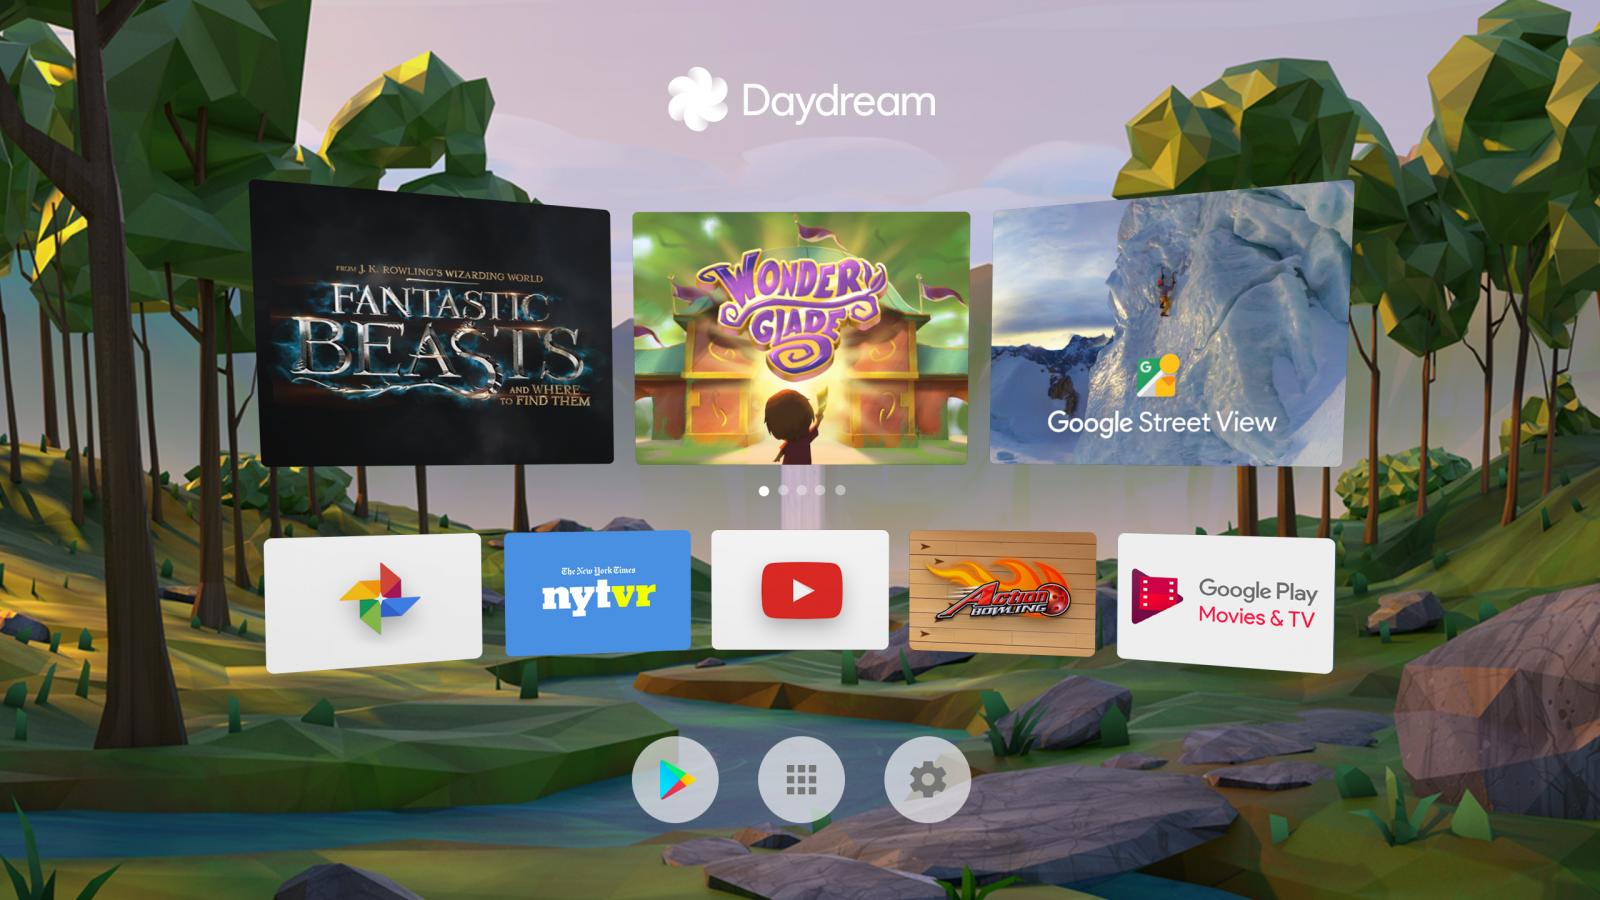 Google Daydream View home